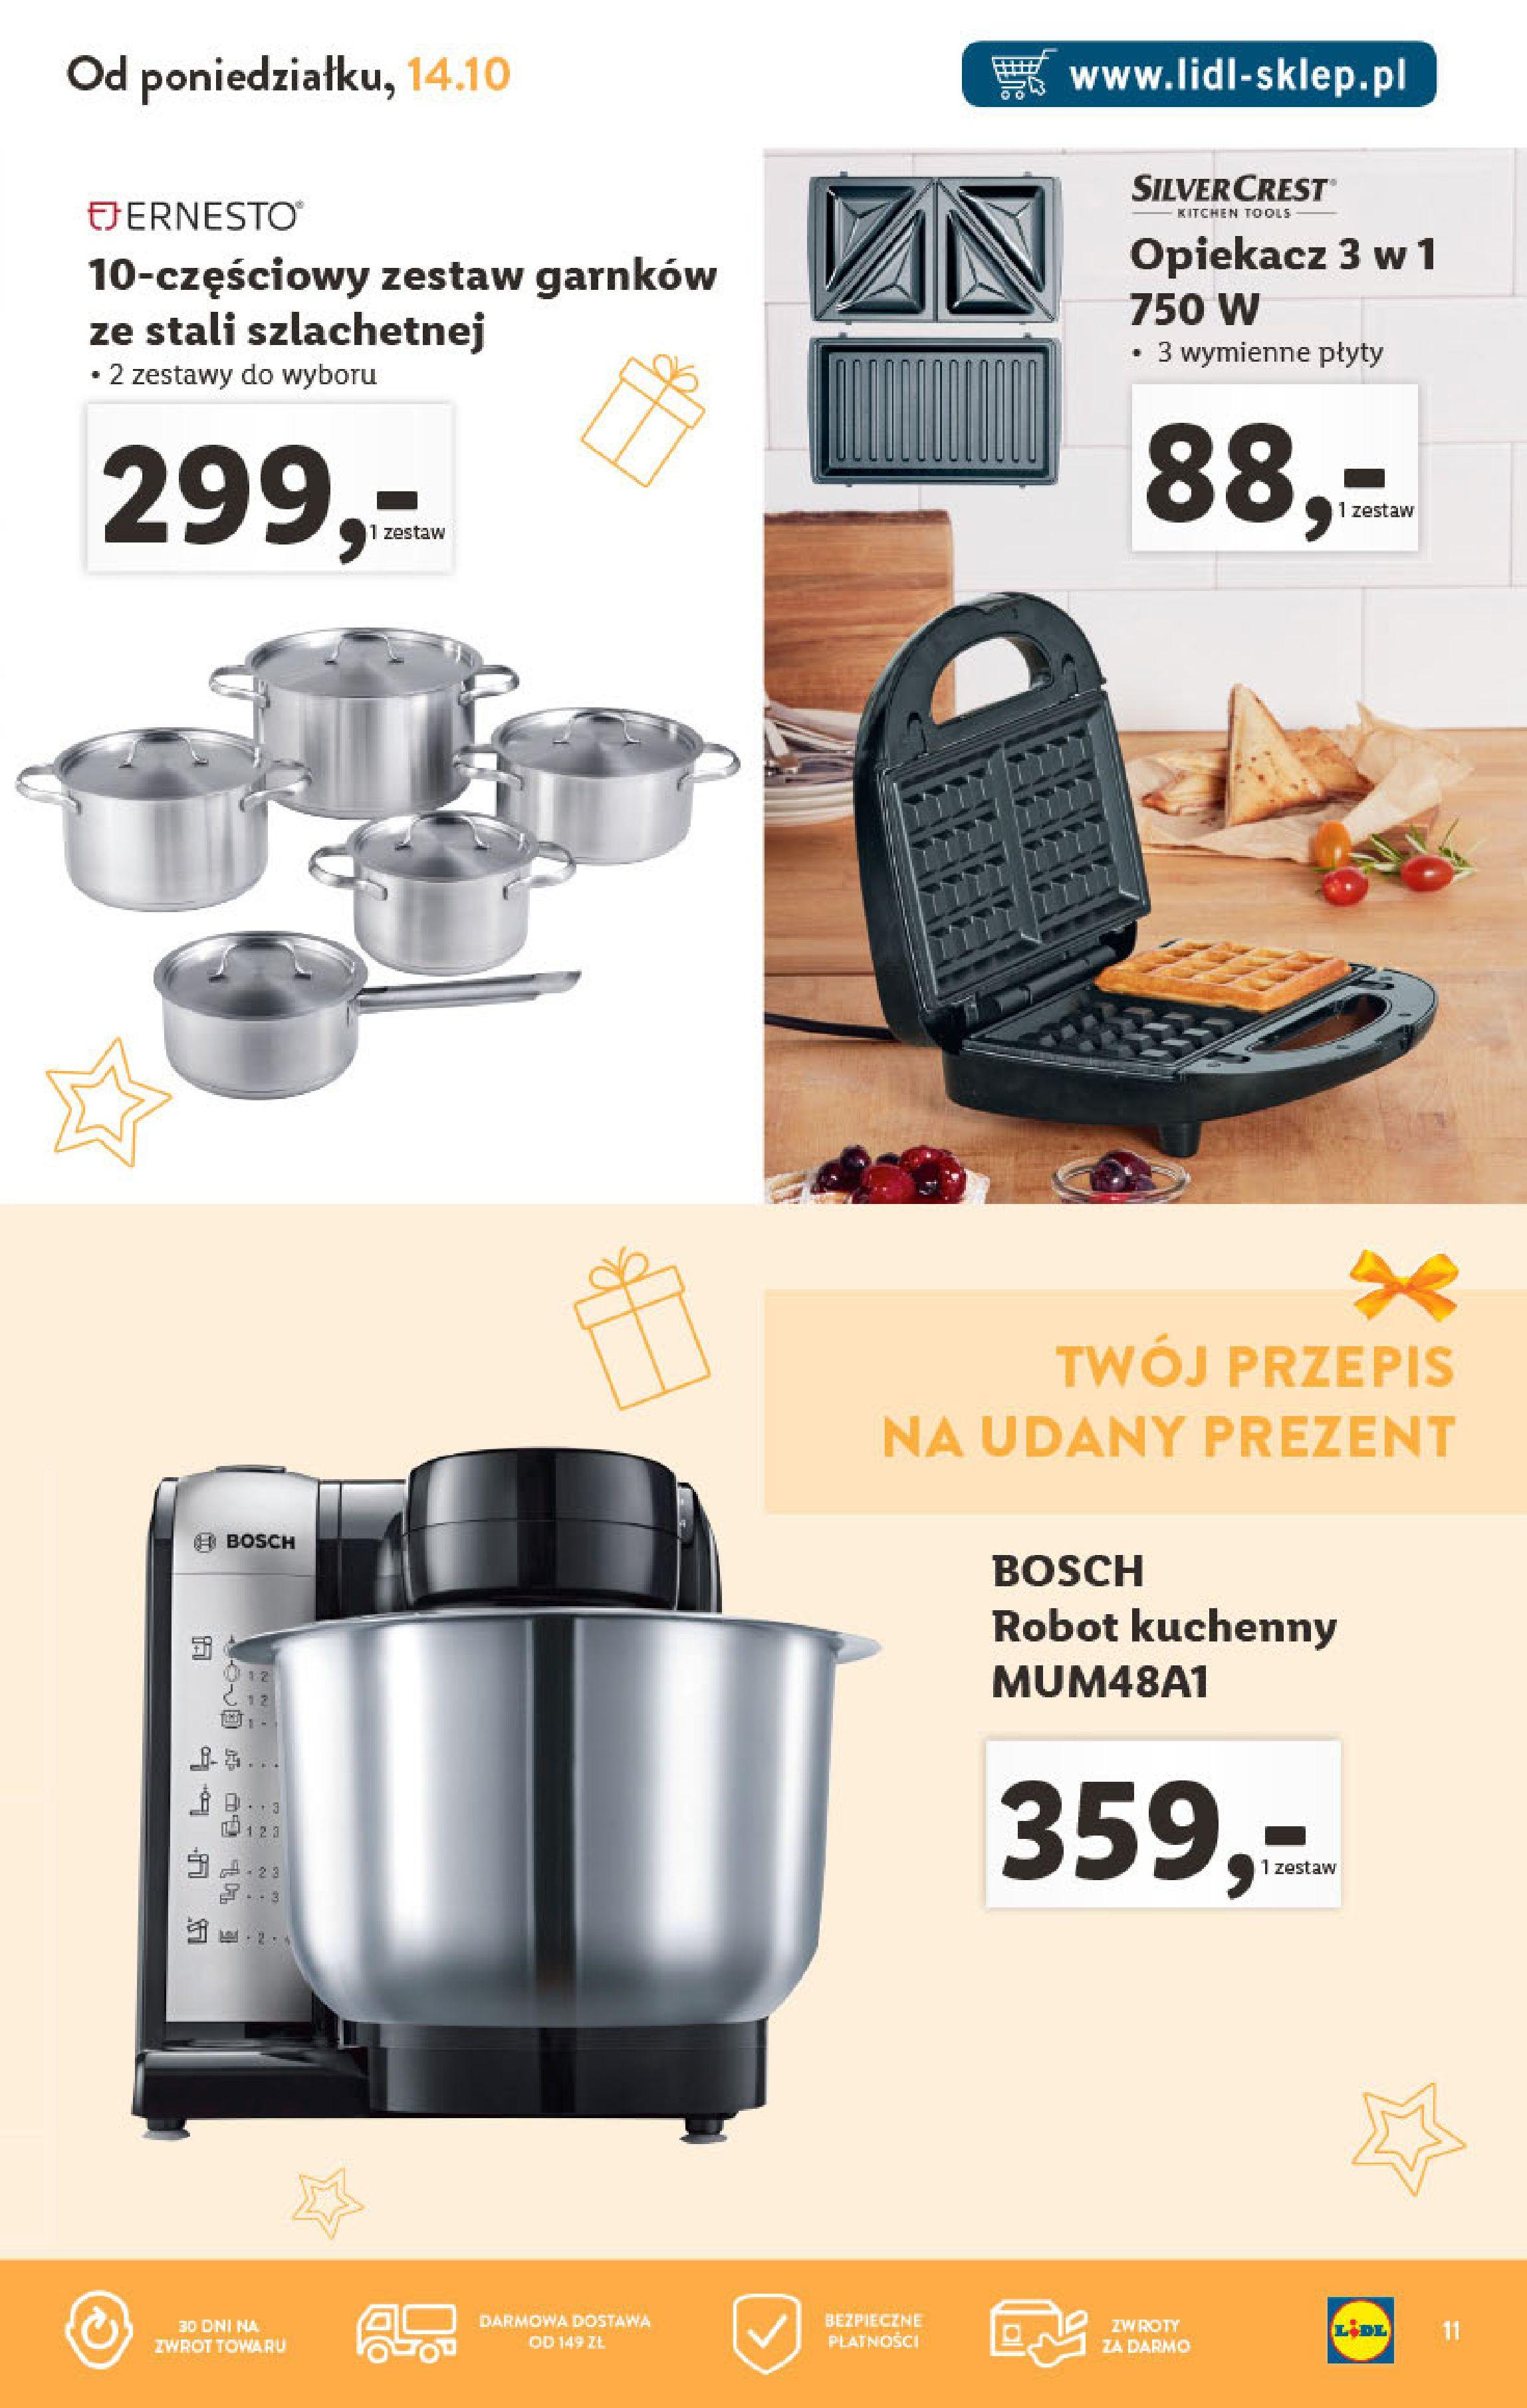 Gazetka Lidl - Katalog Online-13.10.2019-02.12.2019-page-11